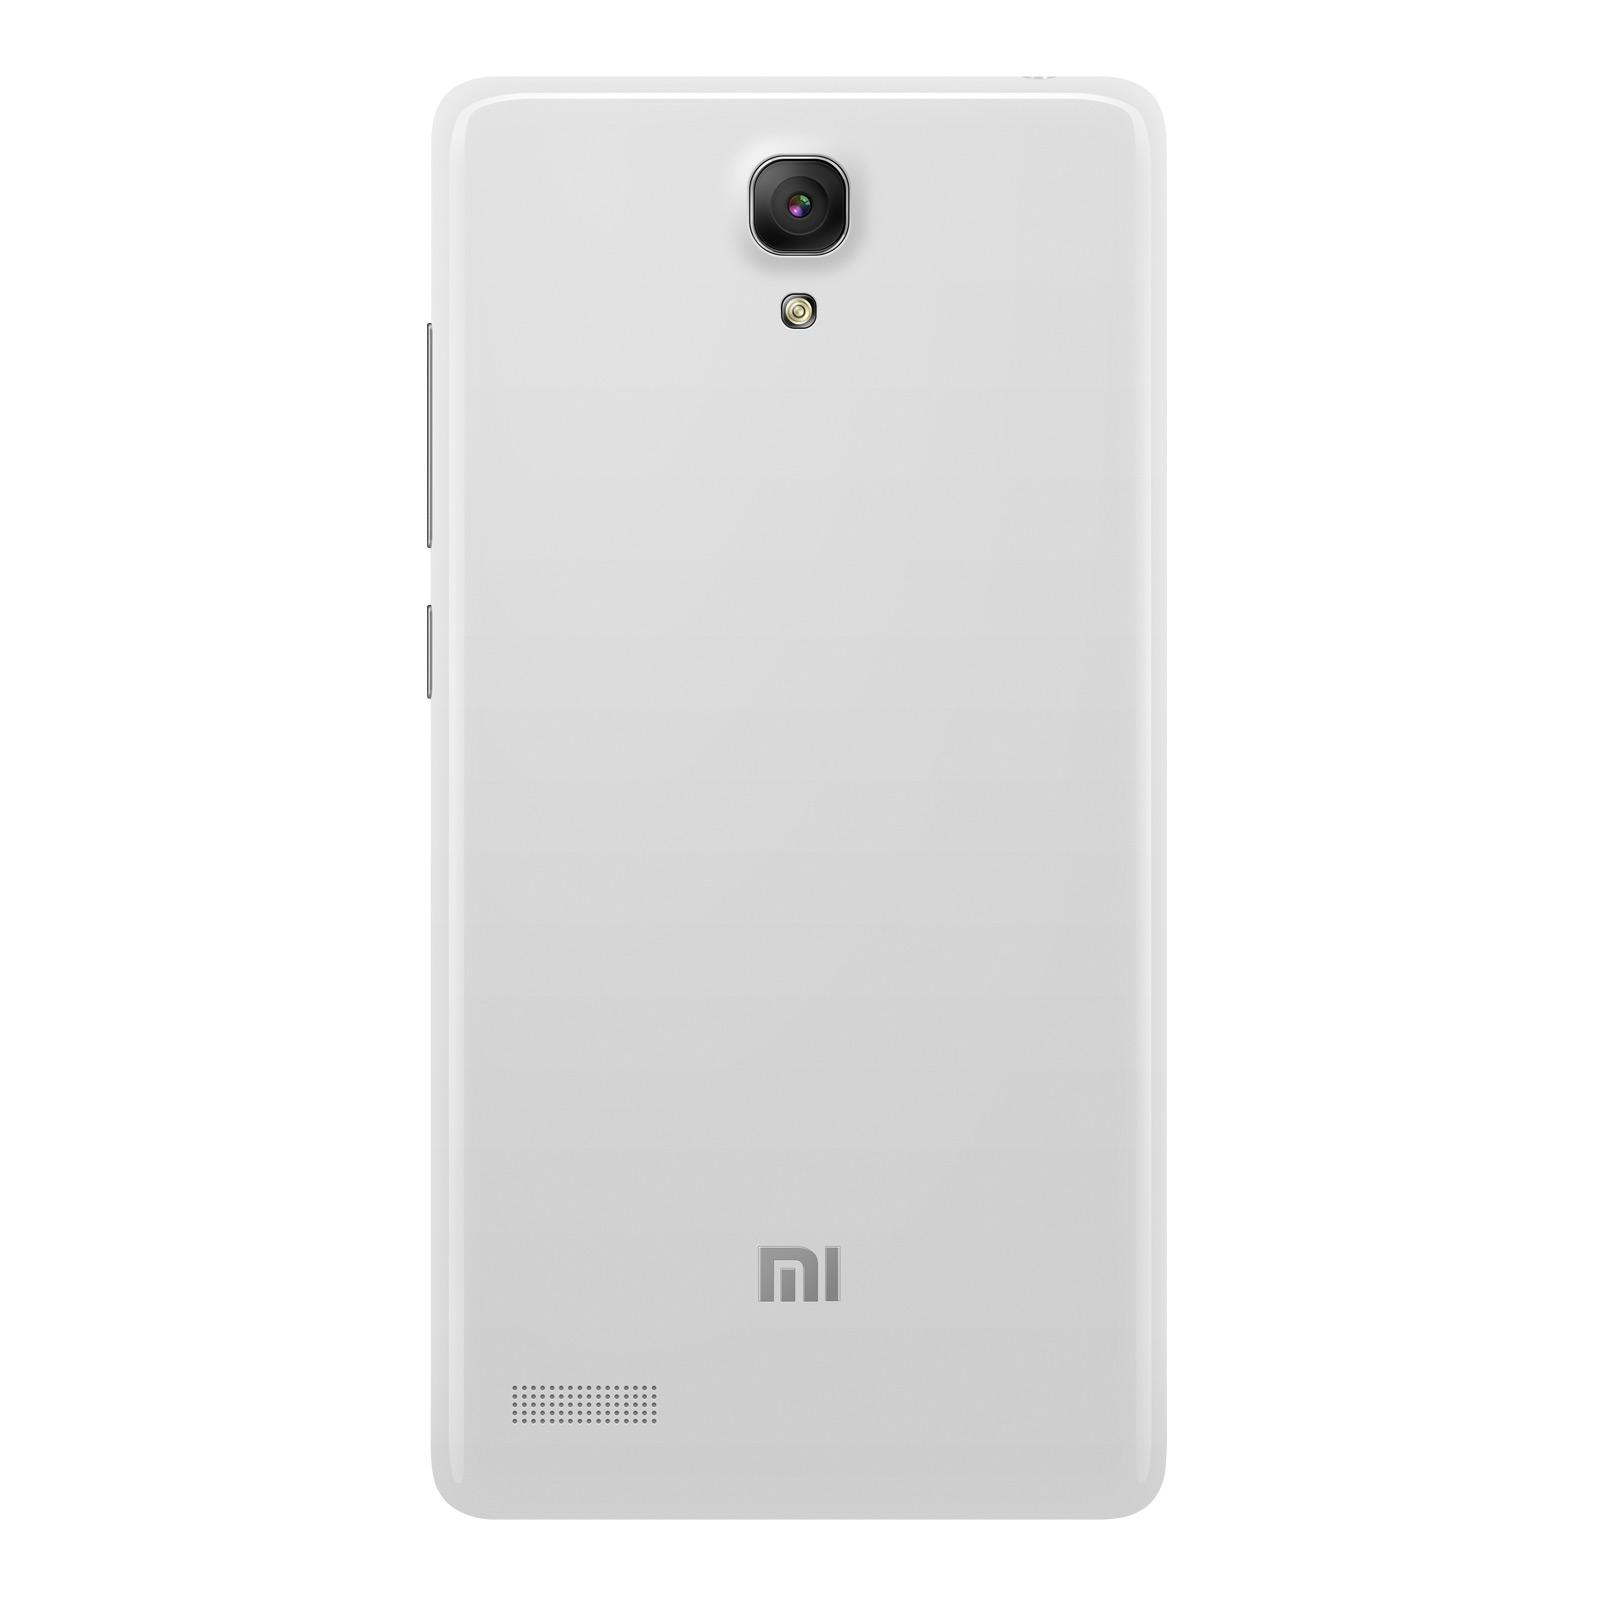 Redmi Note Prime Price Buy Online Mi India Xiaomi 2 4g Lte Dual Simcard Ram 1gb Internal 8gb Previous